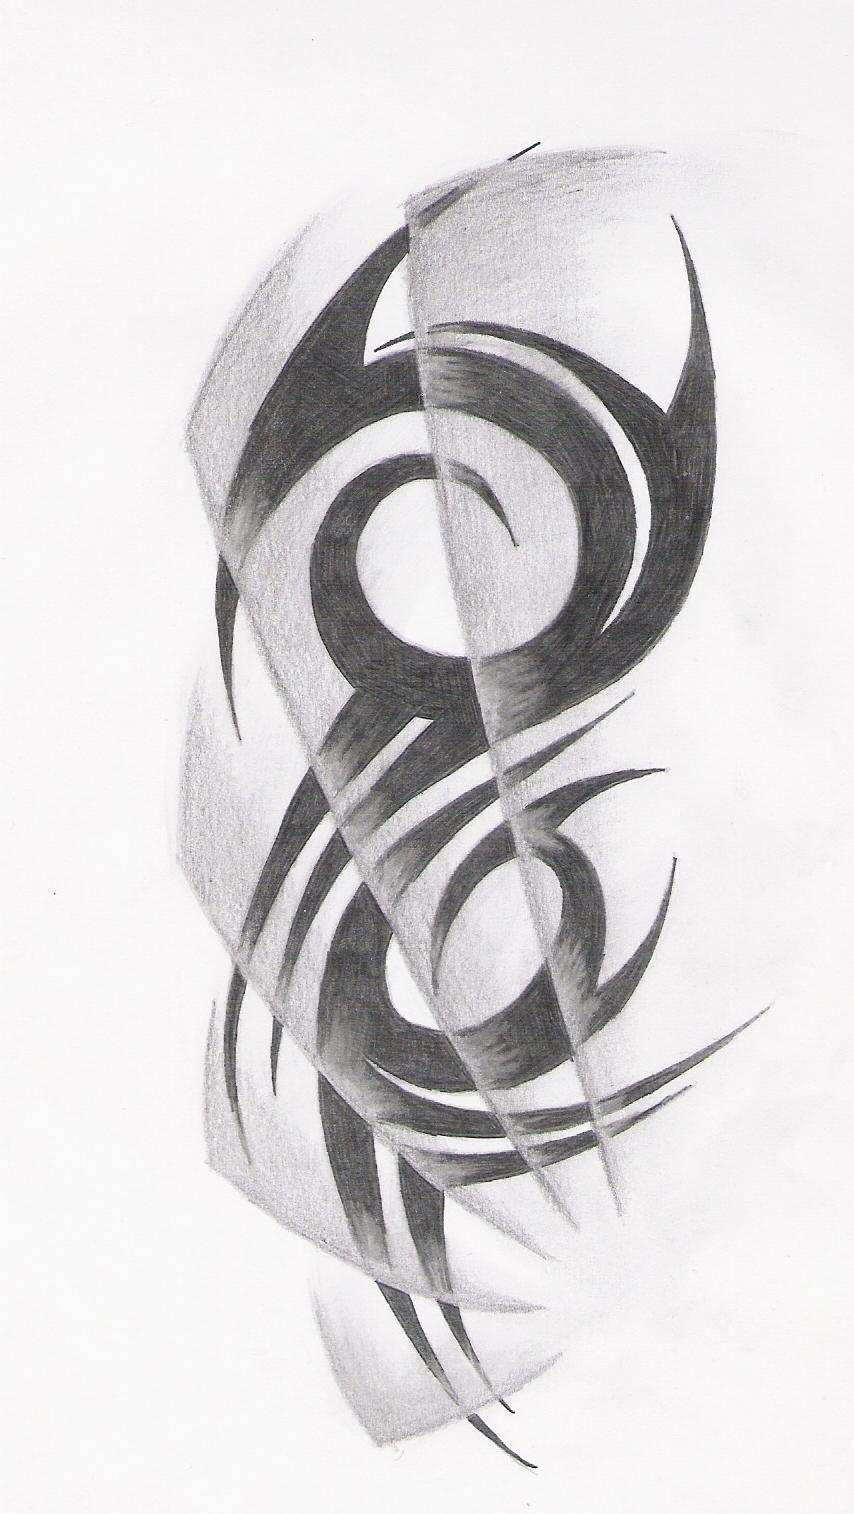 tribal tattoo draw by rockwell88 on deviantart. Black Bedroom Furniture Sets. Home Design Ideas